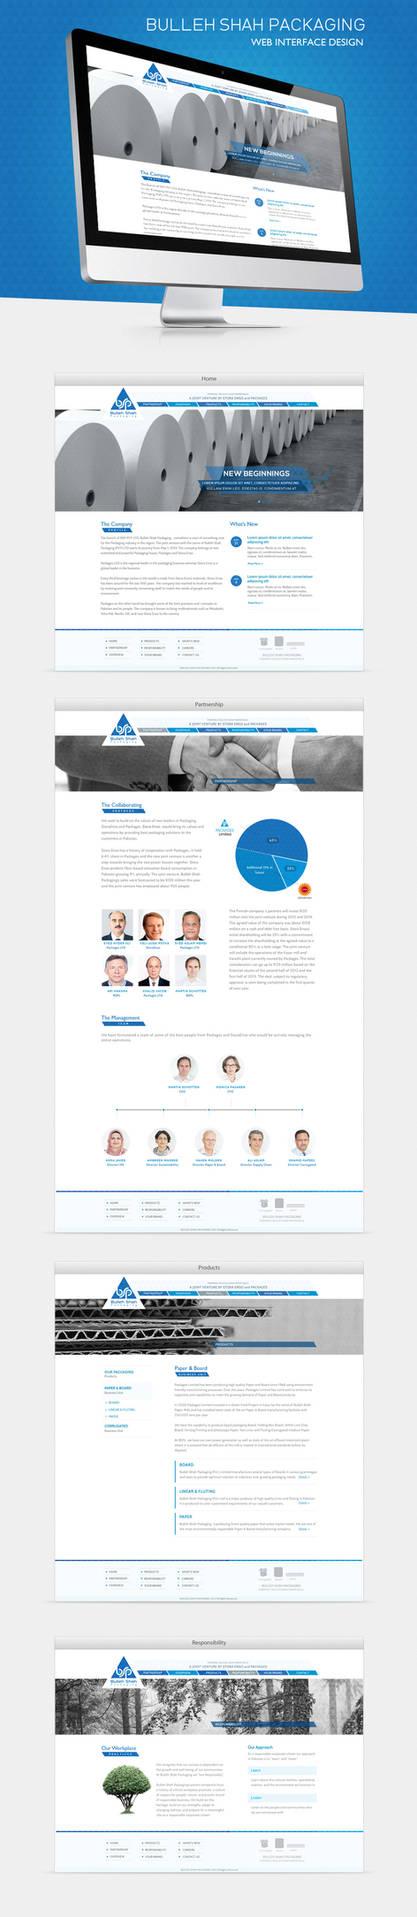 Bulleh Shah Packaging Web Design by ujala